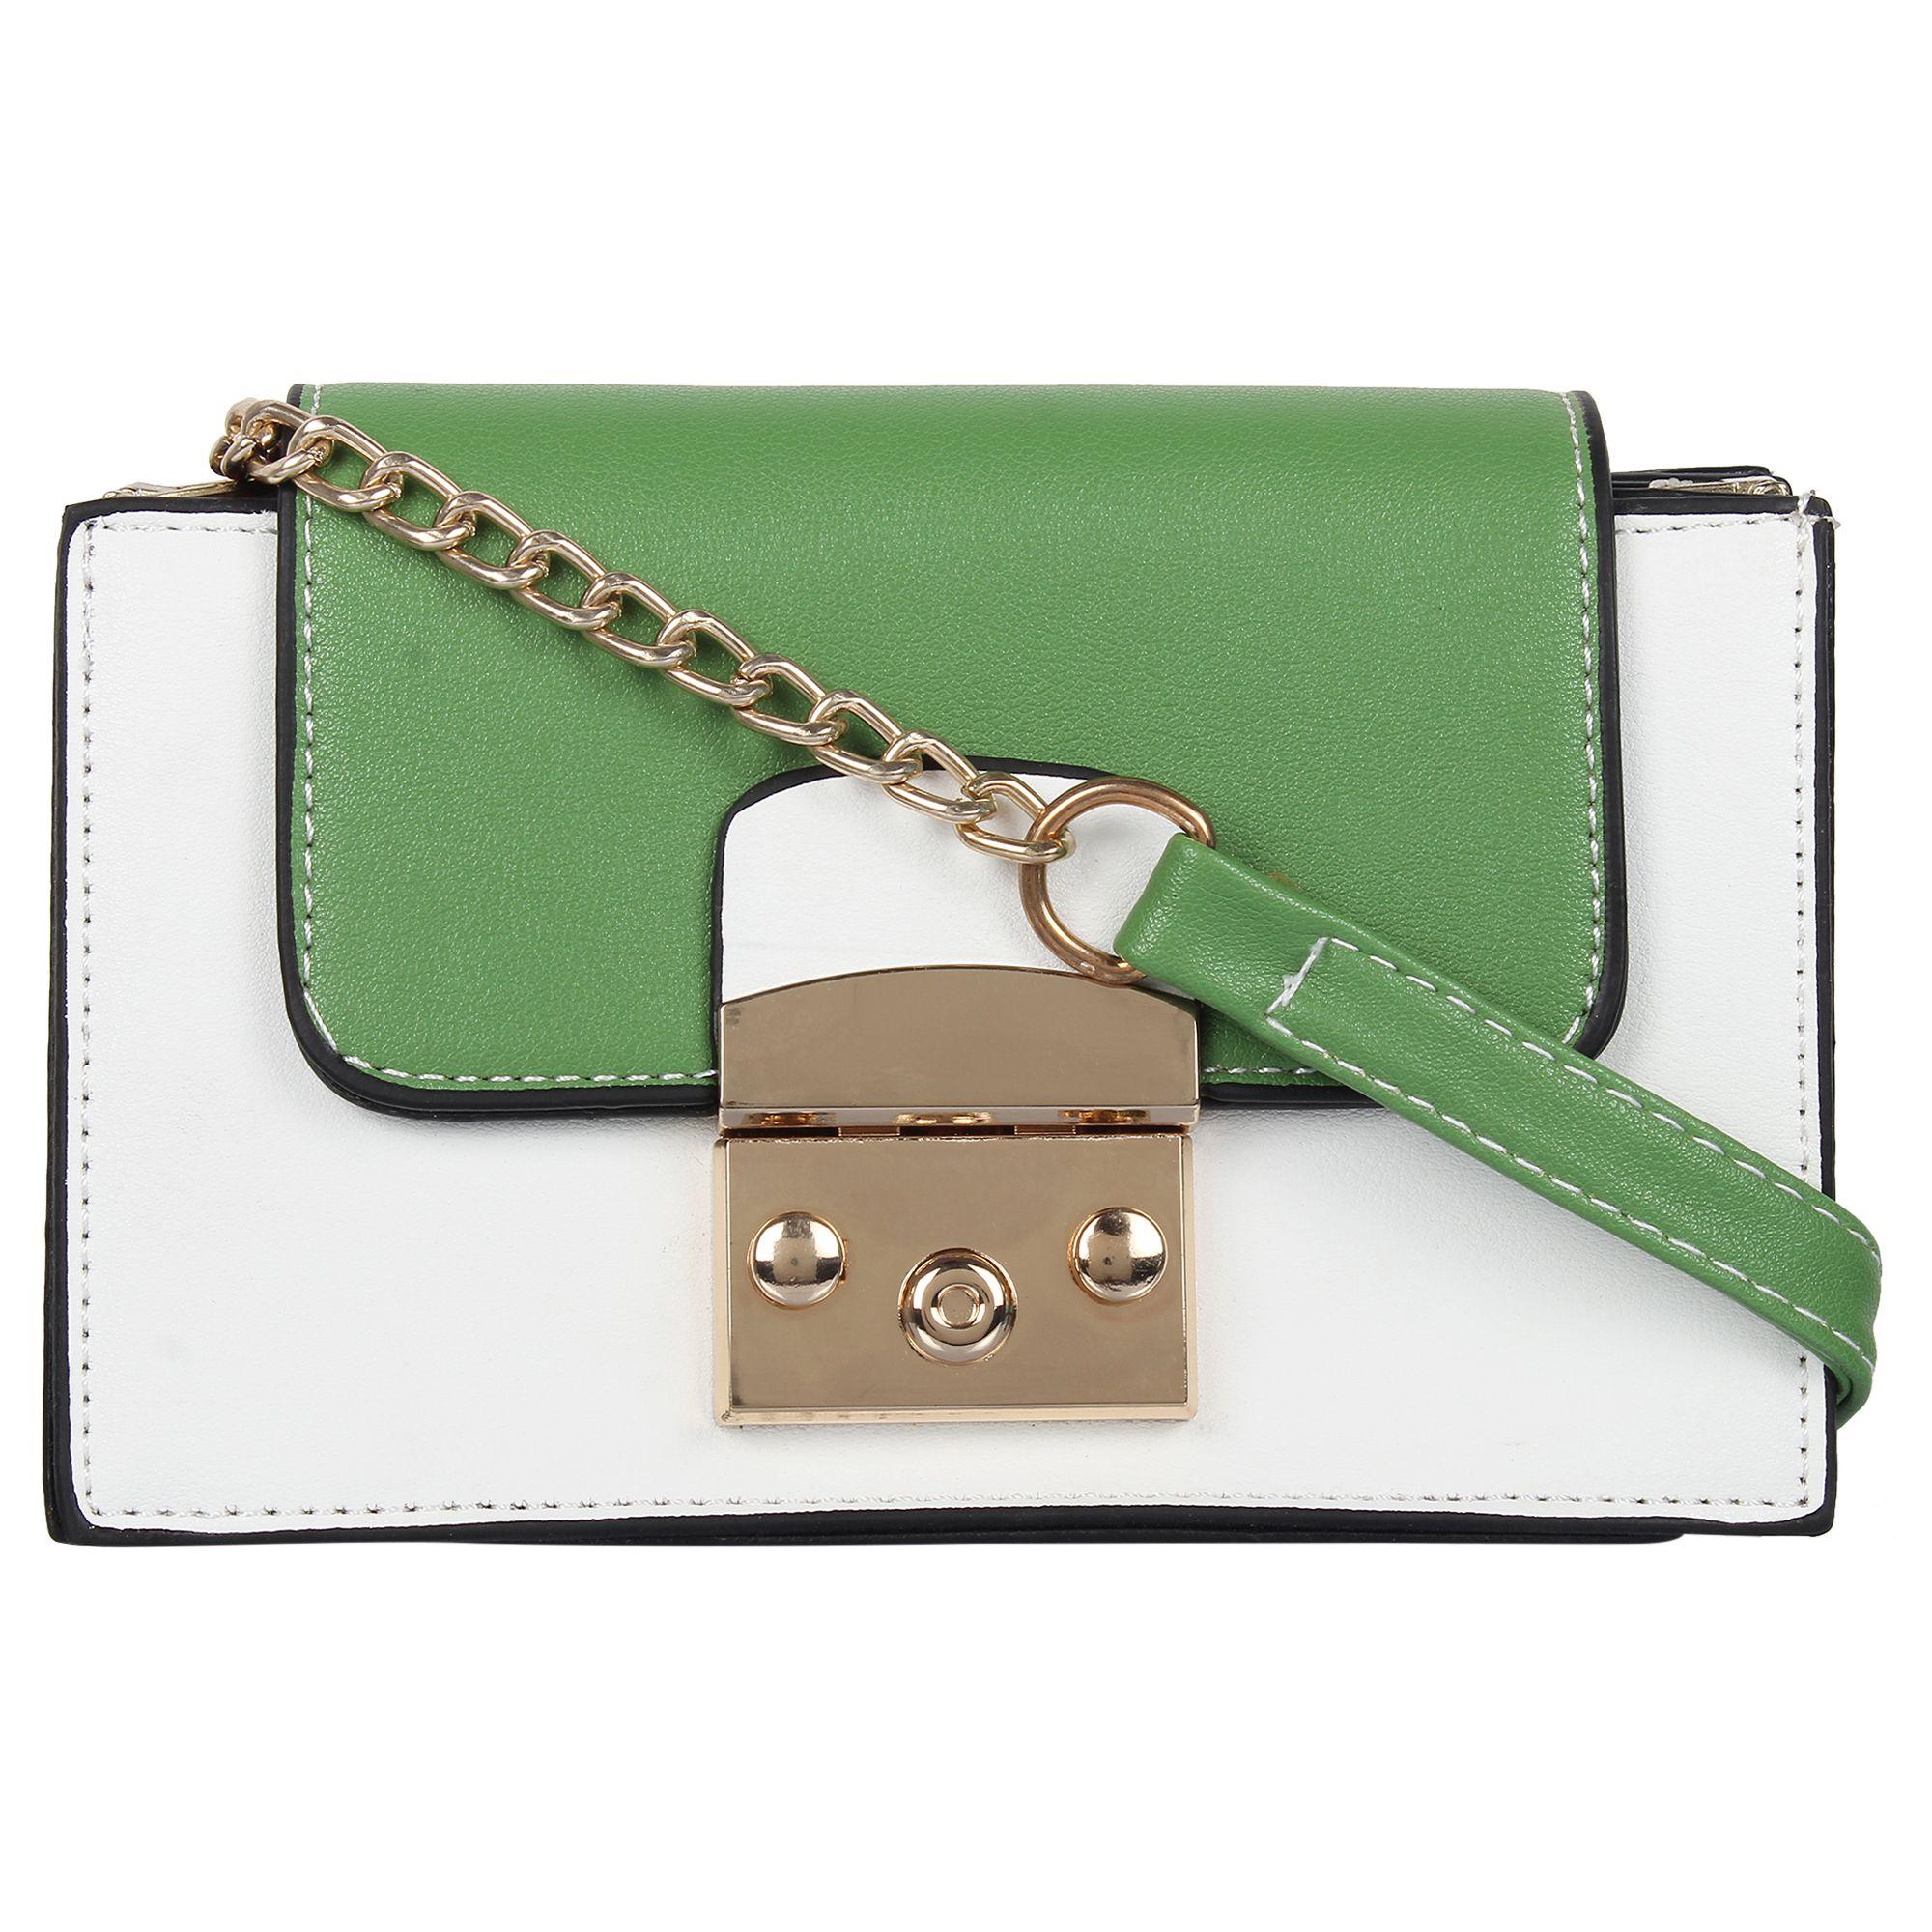 Fashion Fanda Green Faux Leather Handheld